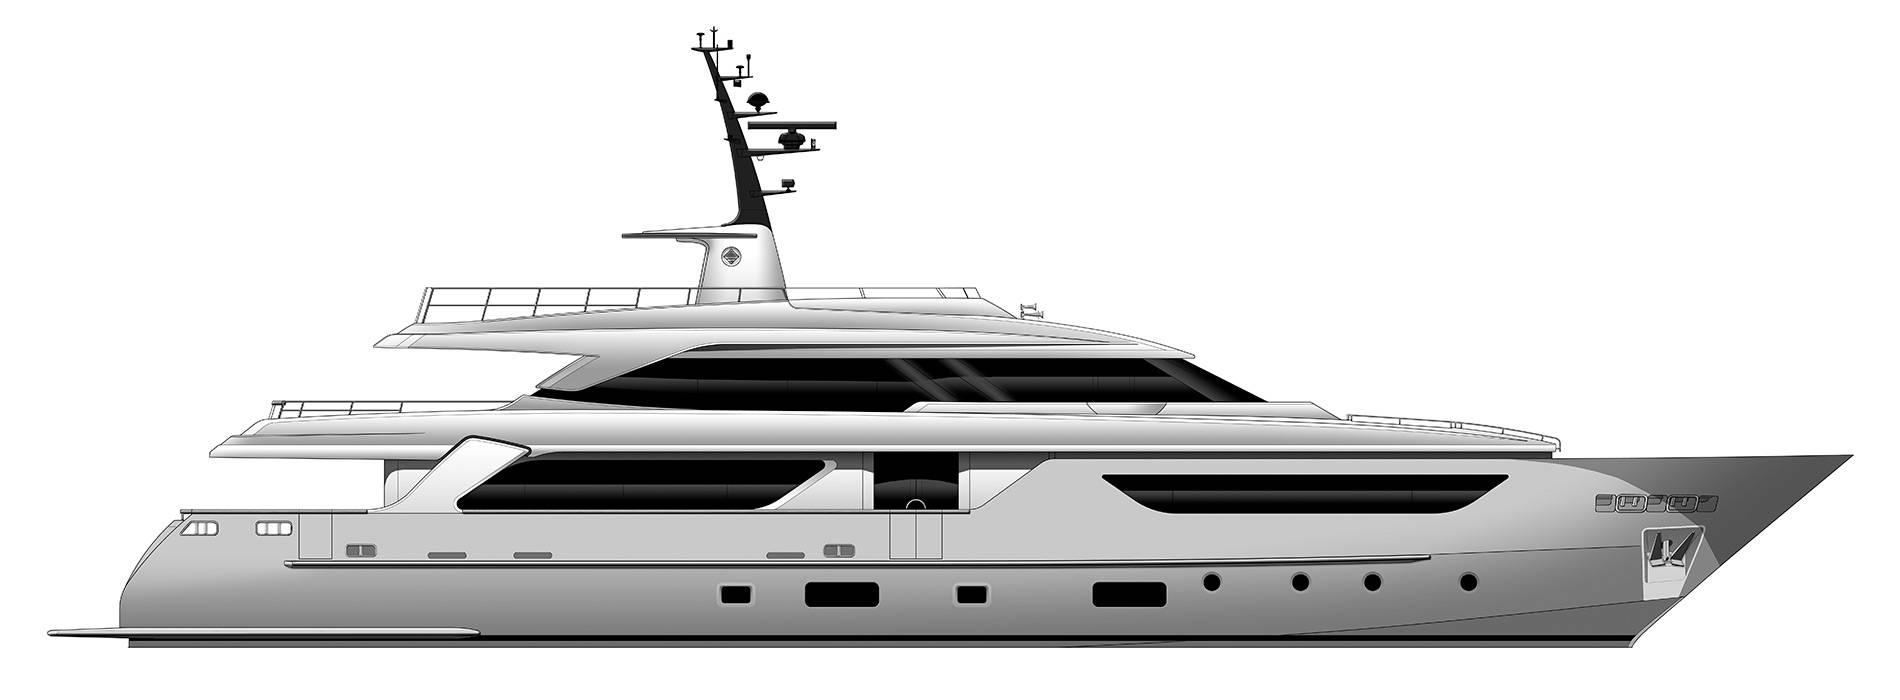 Sanlorenzo Yachts SD126 外观